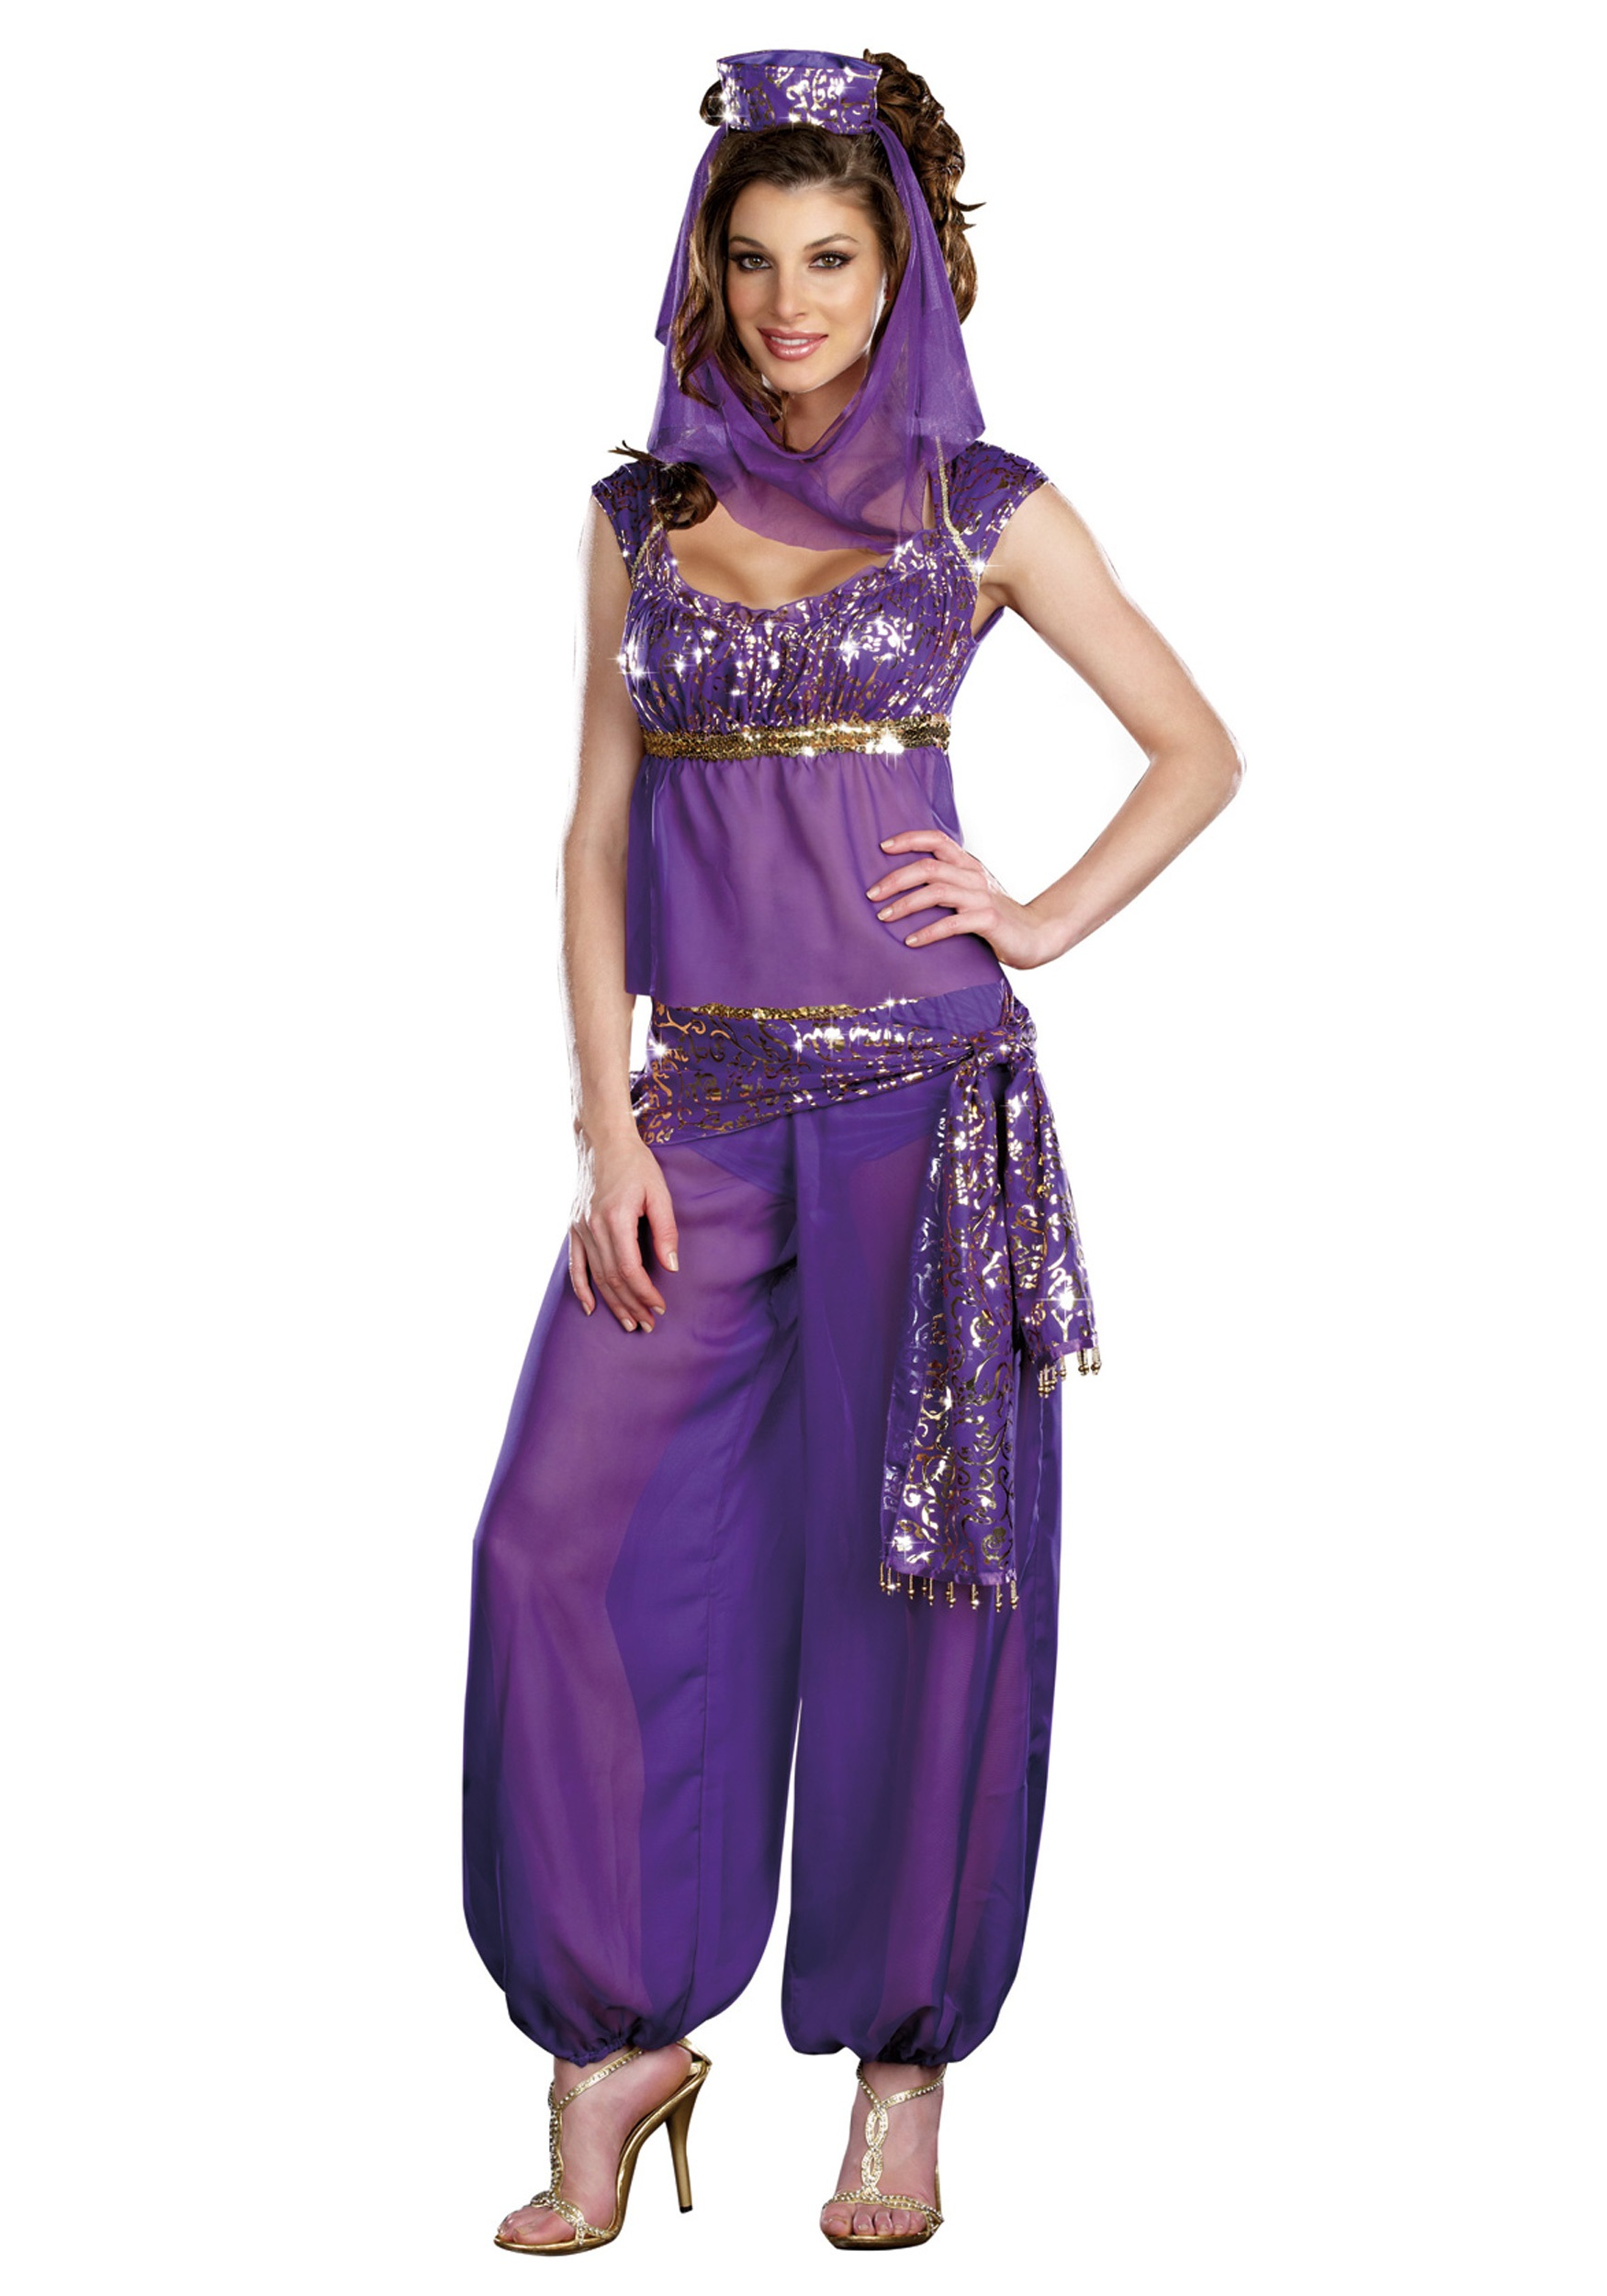 Sexy Purple Genie Costume  sc 1 st  Halloween Costumes & Sexy Purple Genie Costume - Halloween Costumes